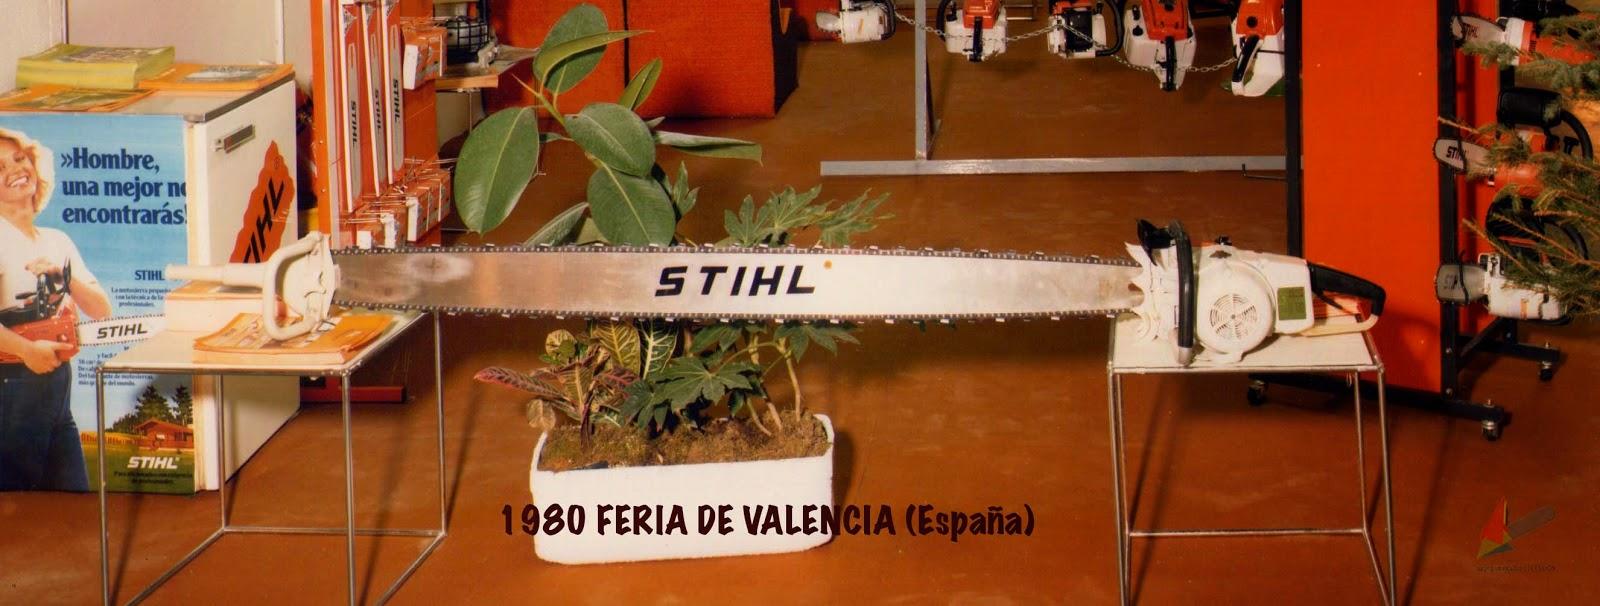 Motosierra Eléctrica Stihl - Vintage/Old Stihl Electric Chainsaw